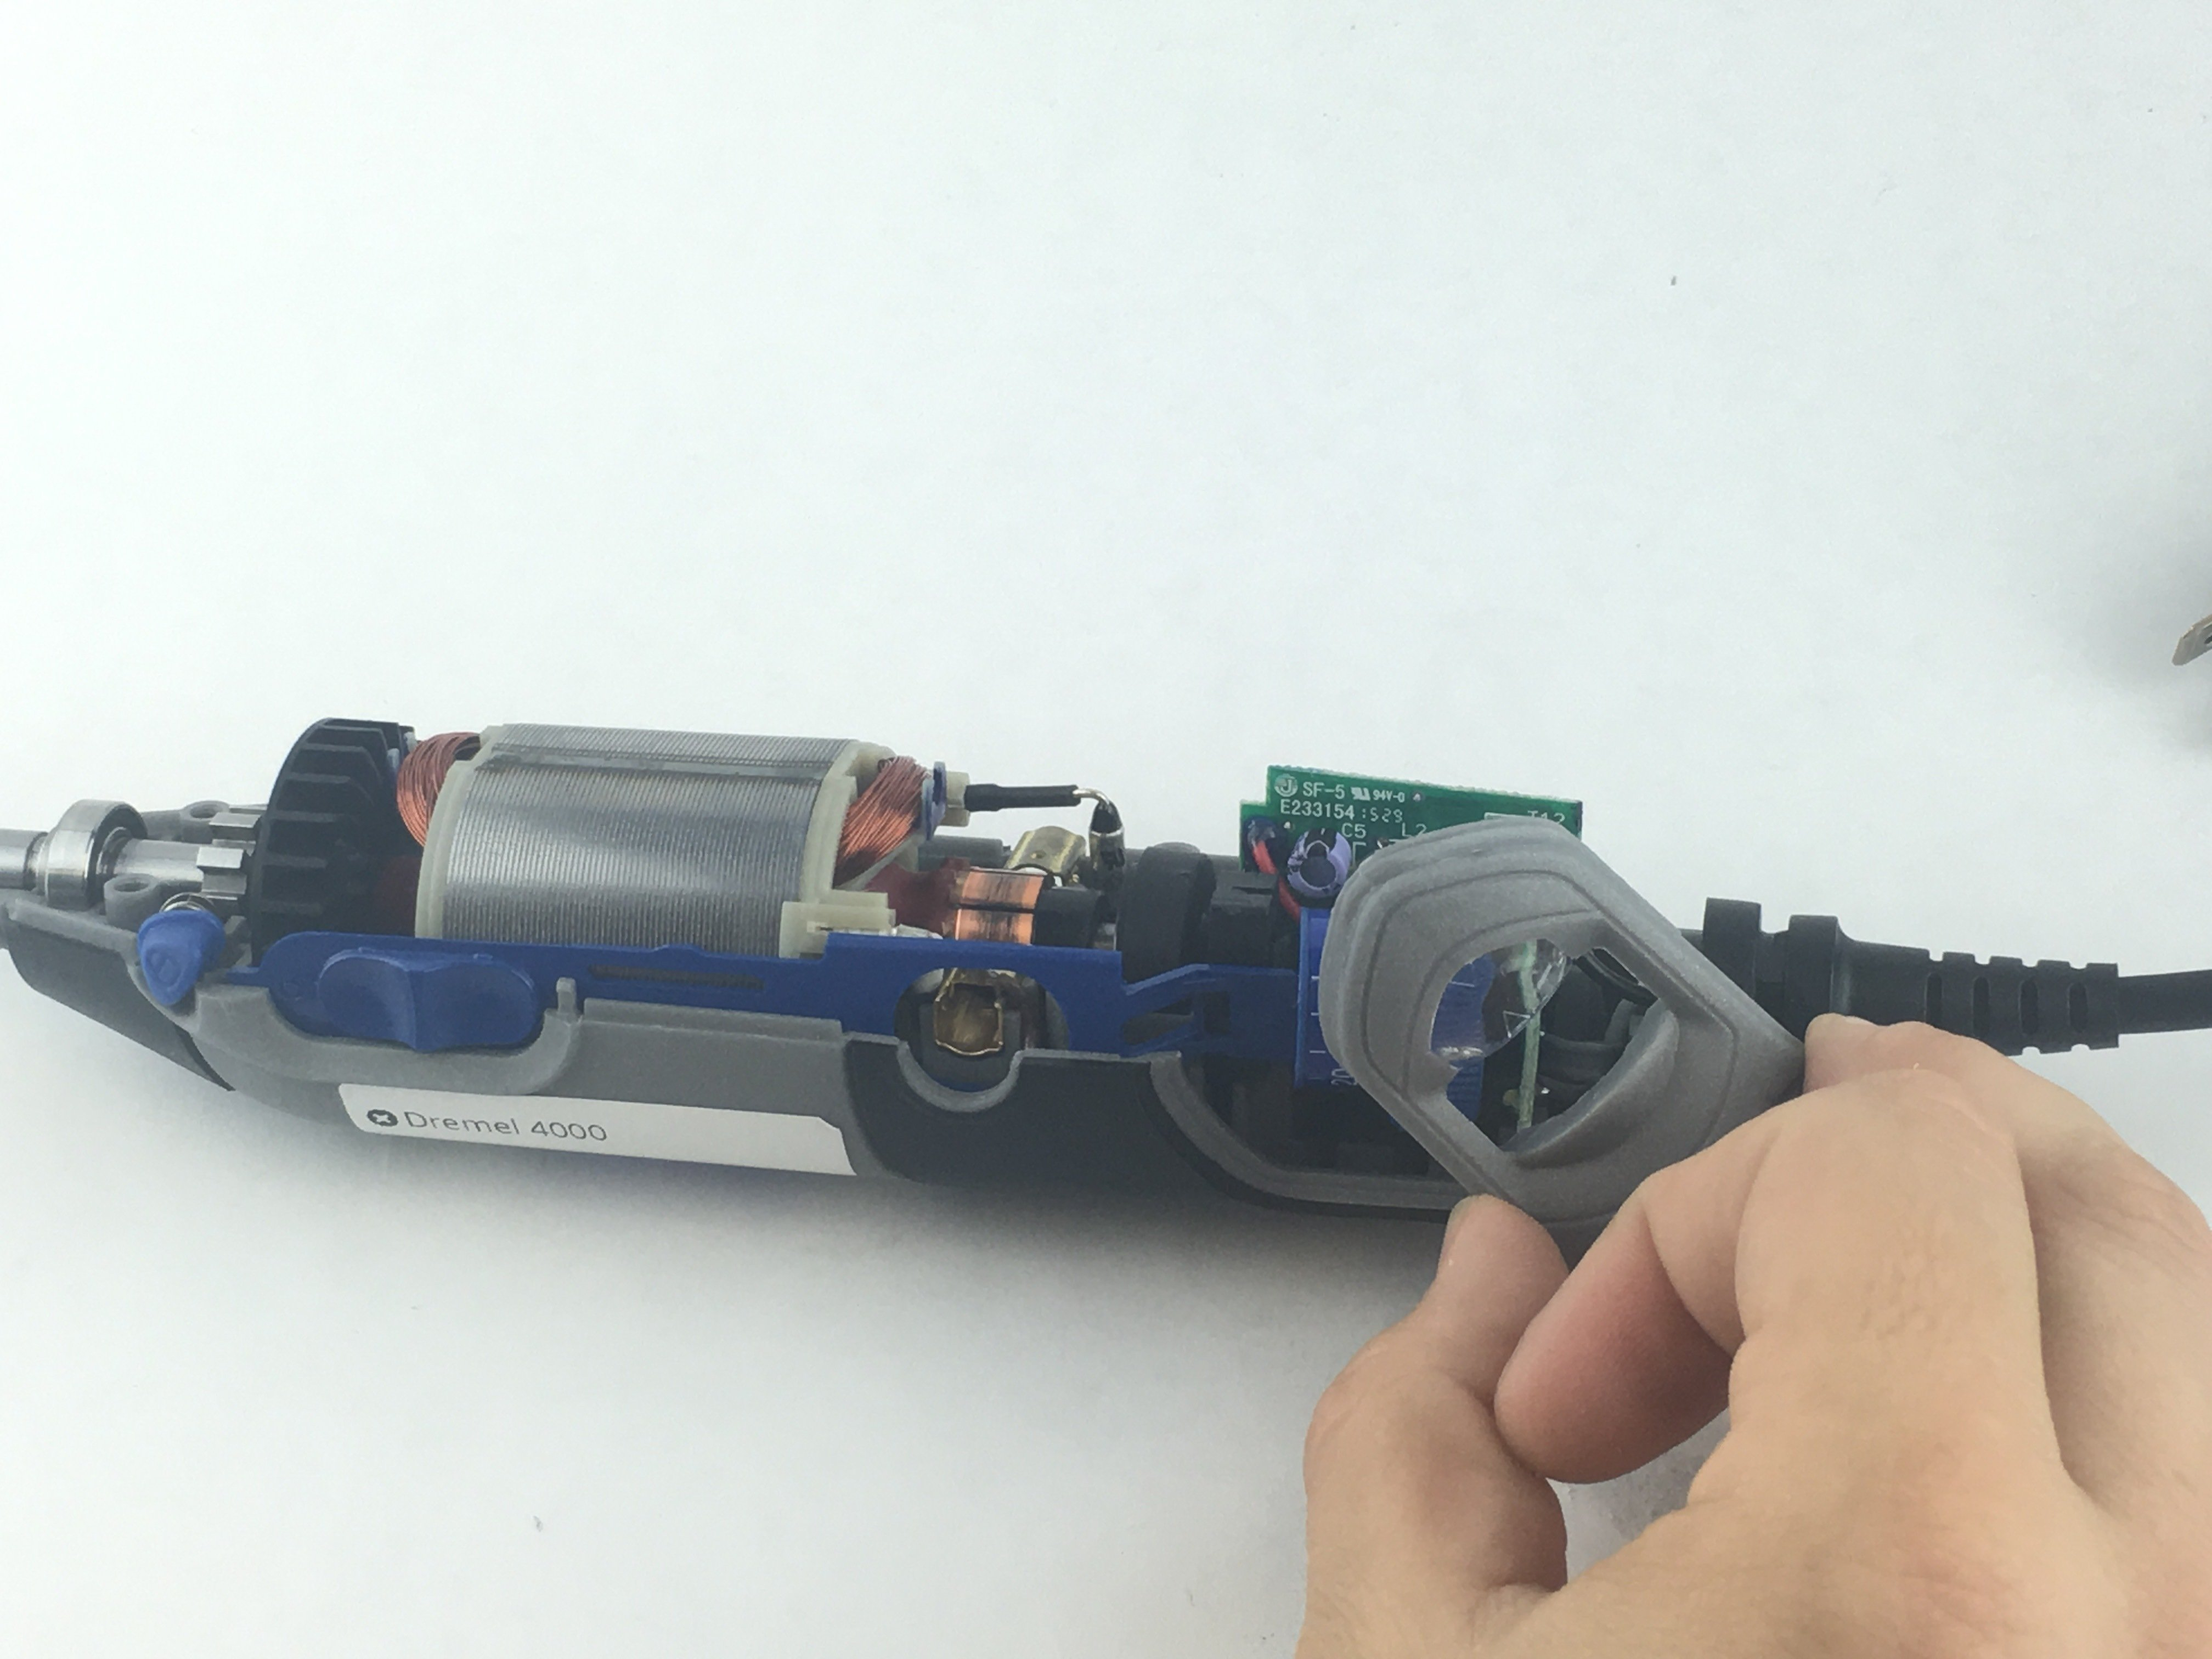 dremel wiring diagram dremel 4000 power cord replacement ifixit repair guide  dremel 4000 power cord replacement